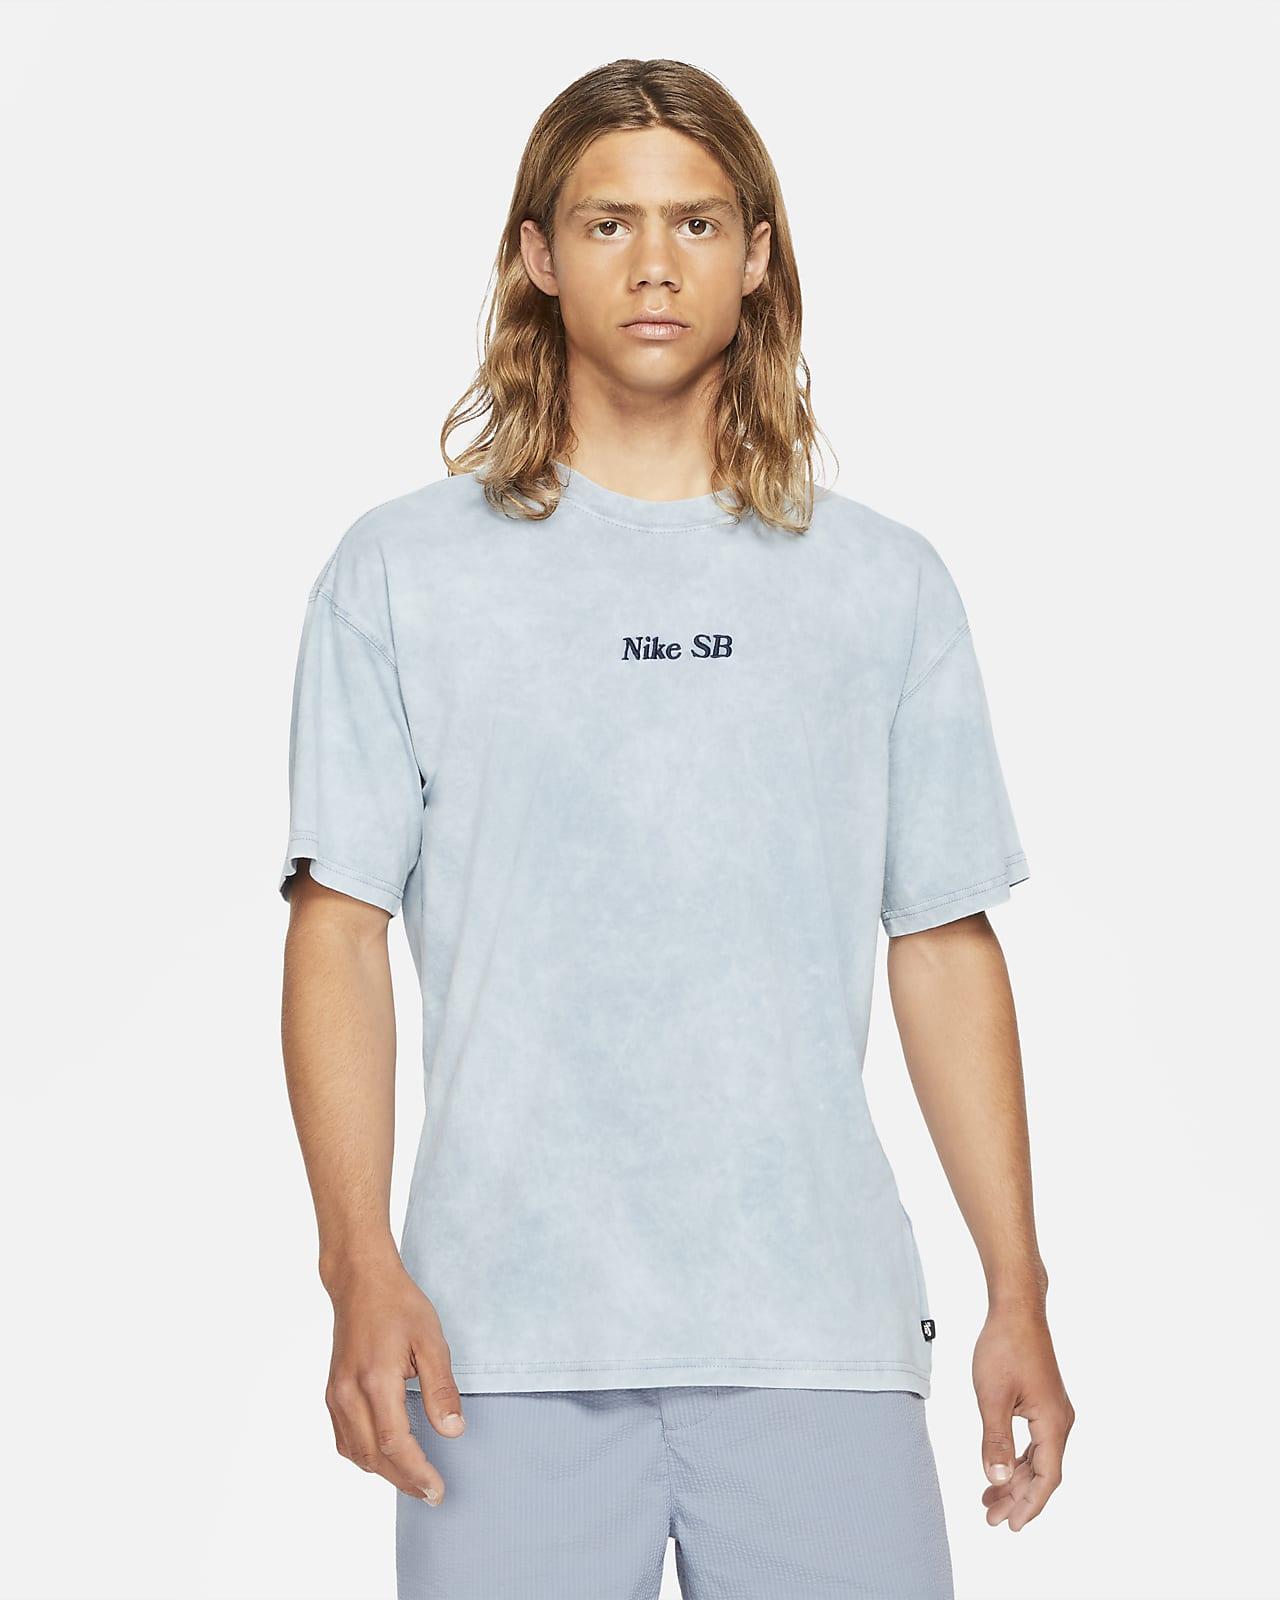 Playera de skateboarding lavada Nike SB